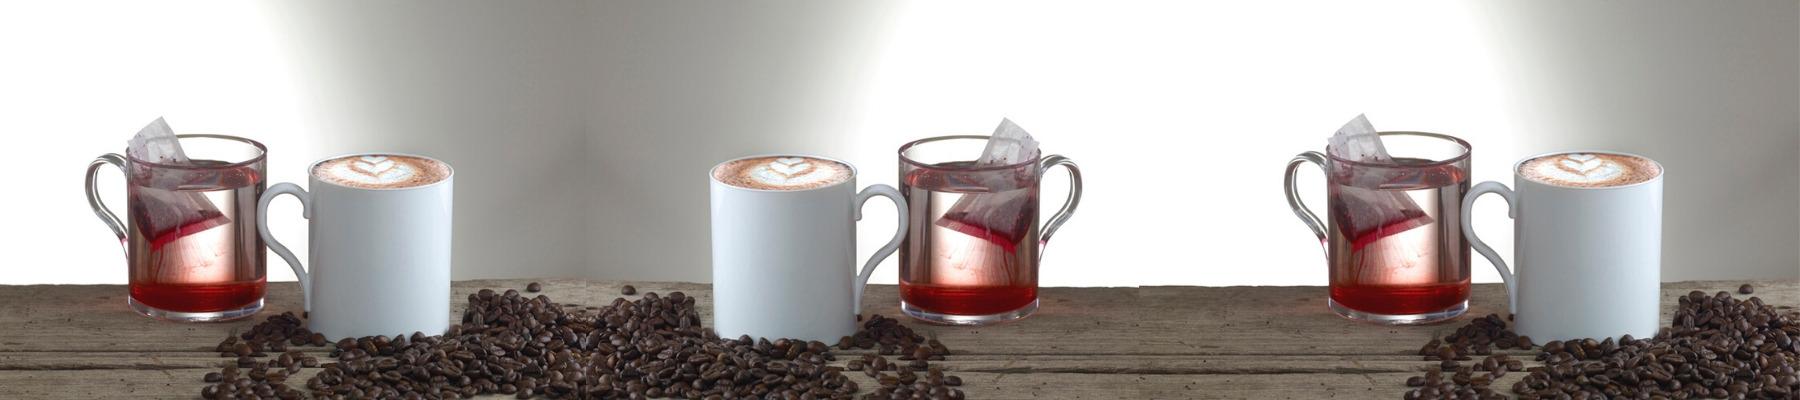 Plastic Coffee Mugs - Polycarbonate II